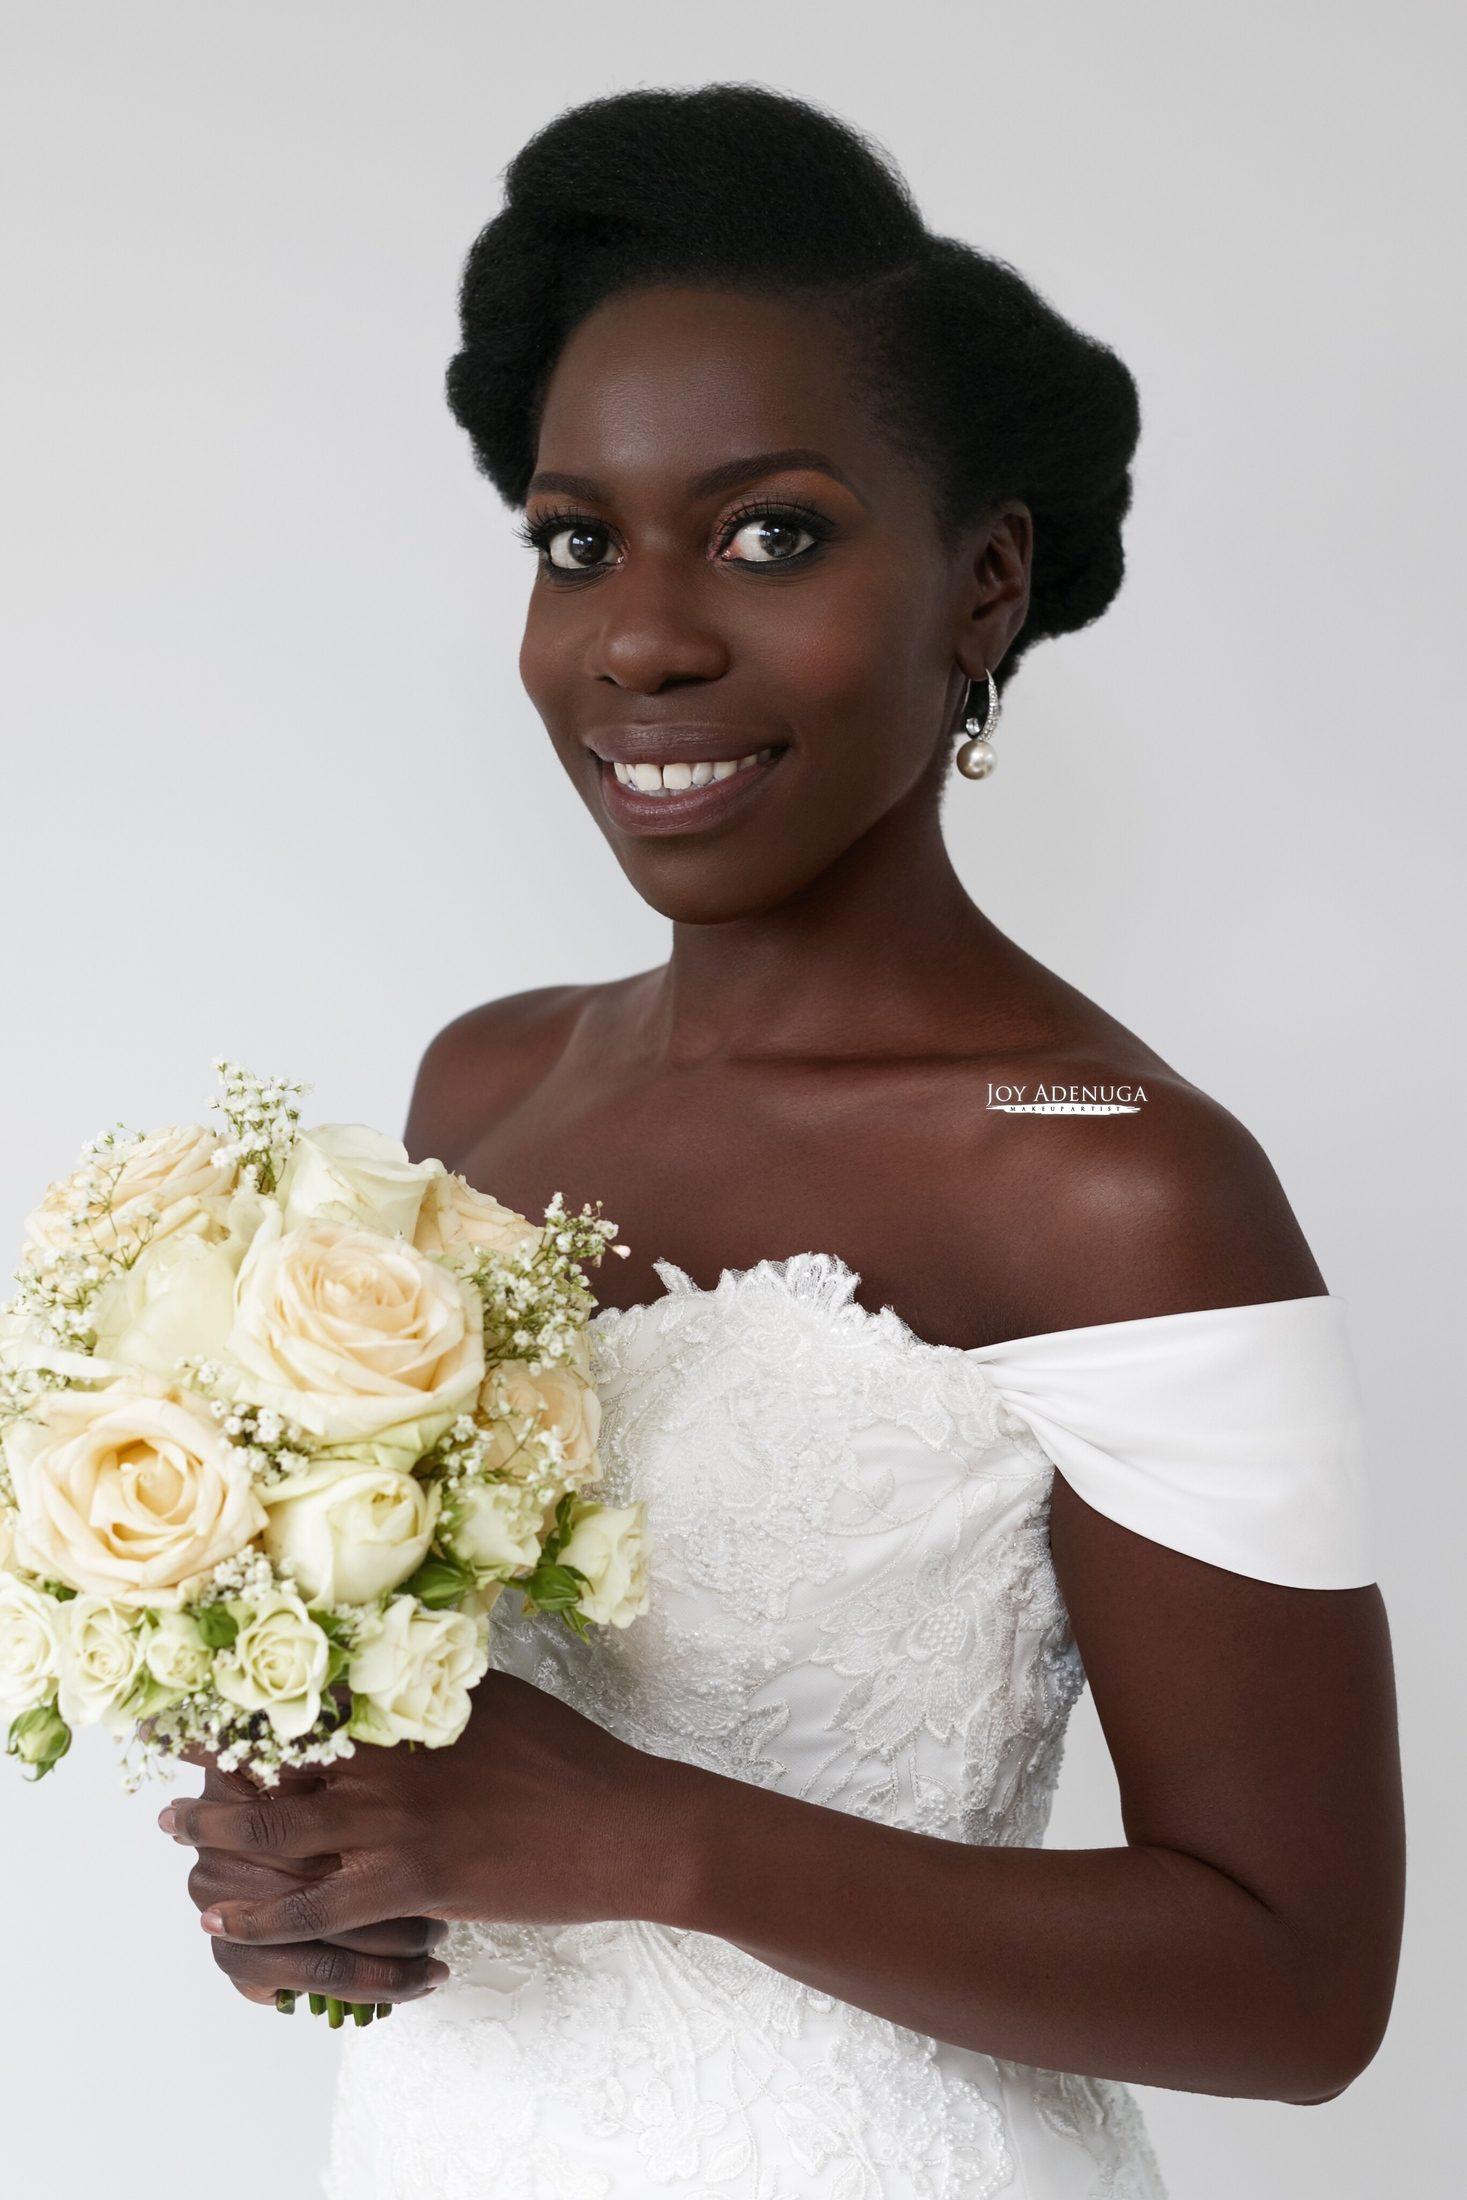 Nadine's Wedding, Melanin Bride, Joy Adenuga, black bride, black bridal blog london, london black makeup artist, london makeup artist for black skin, black bridal makeup artist london, makeup artist for black skin, nigerian makeup artist london, makeup artist for women of colour, black beauty,